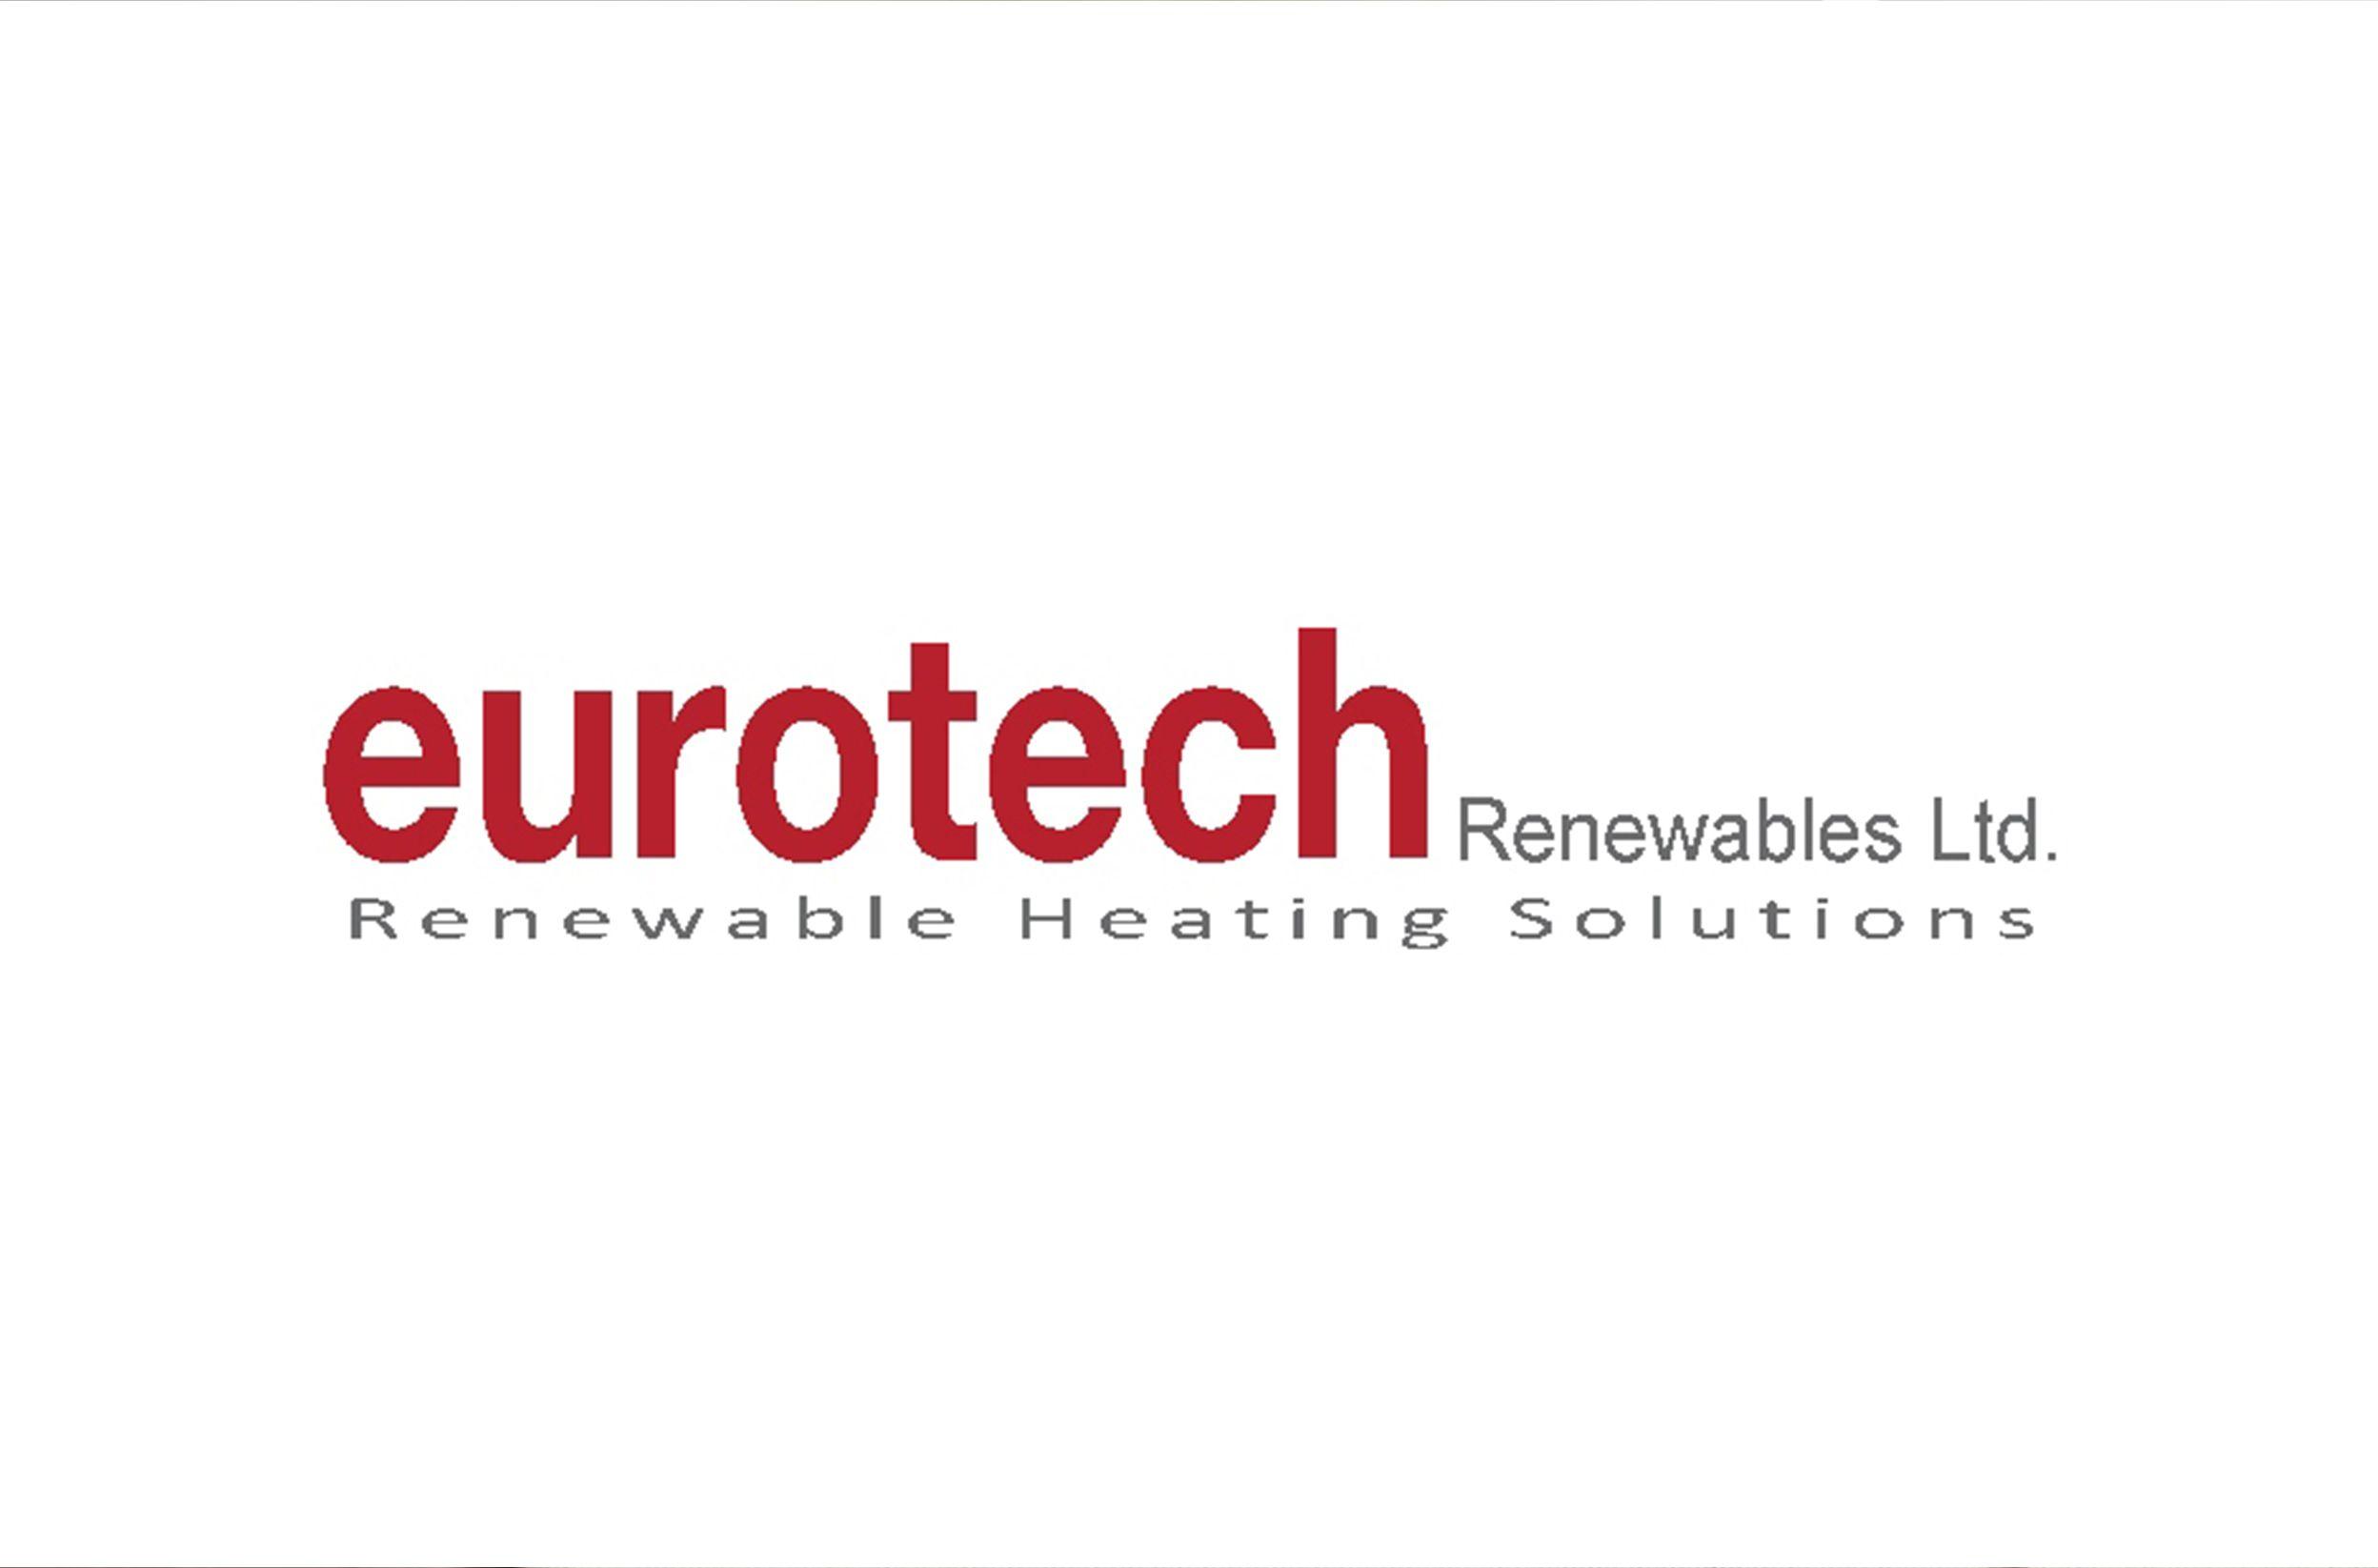 eurotech-1